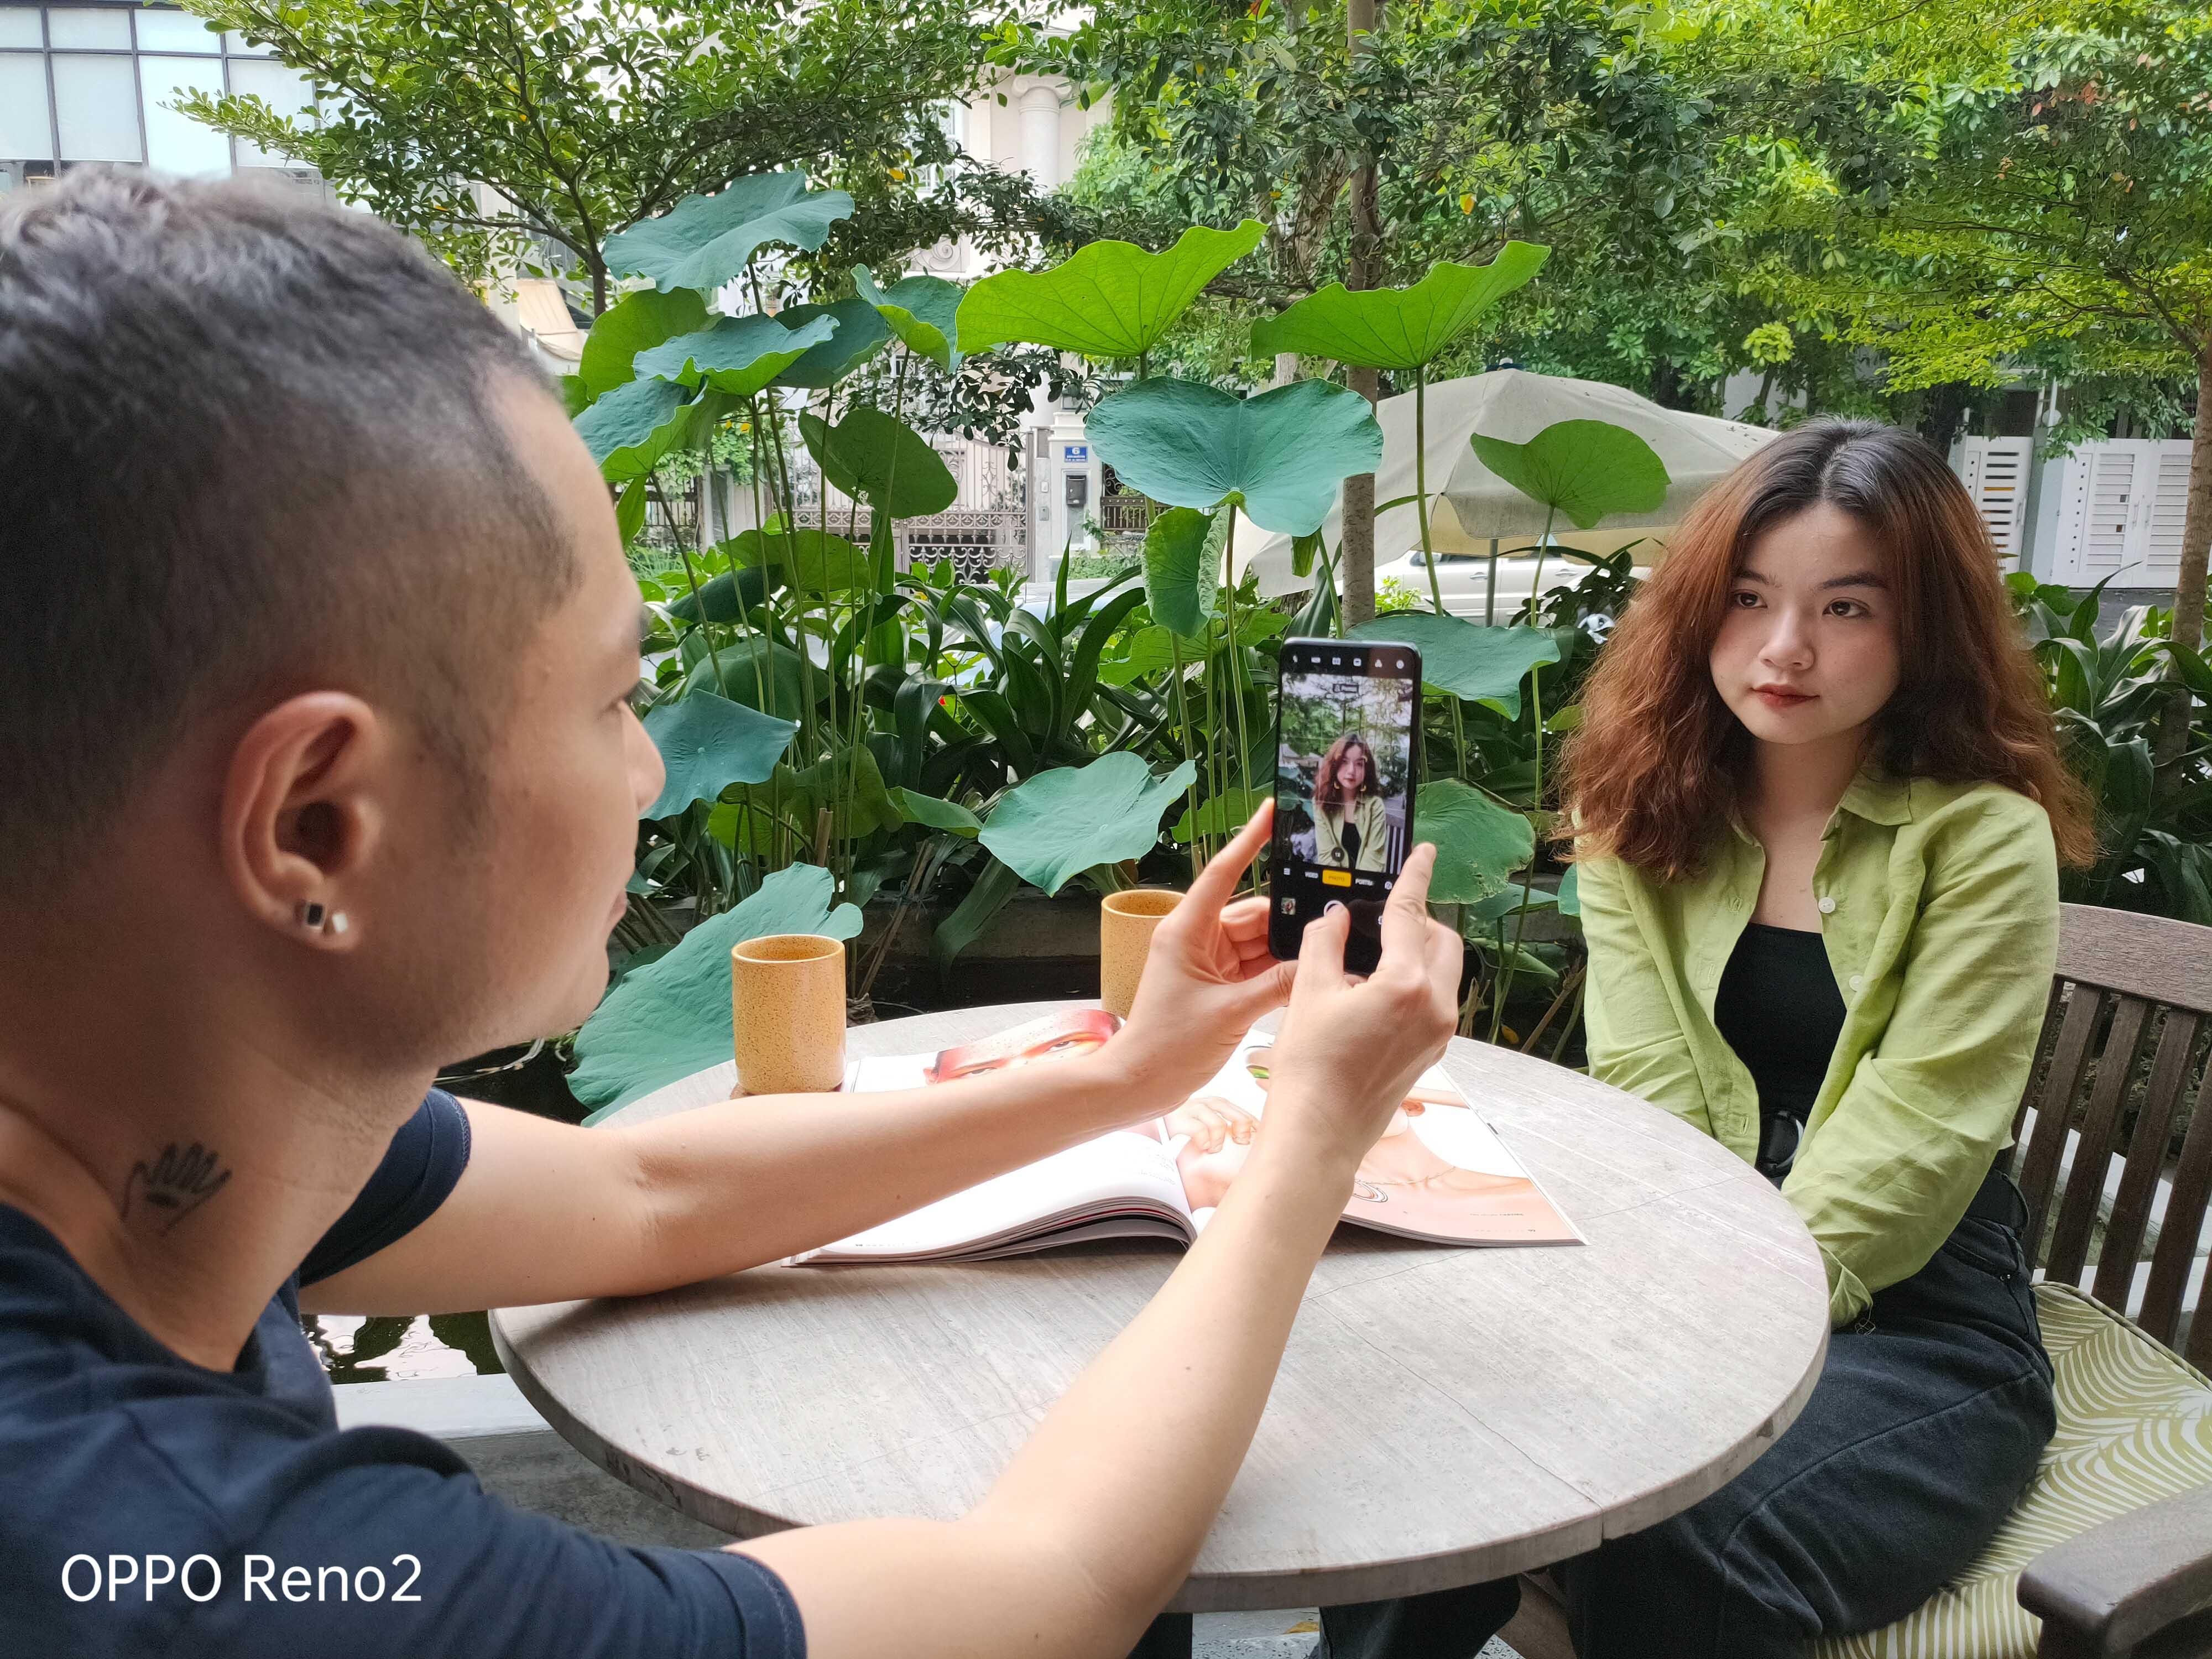 oppo reno2 v Dzung Yoko - PR4 - elle vietnam 11